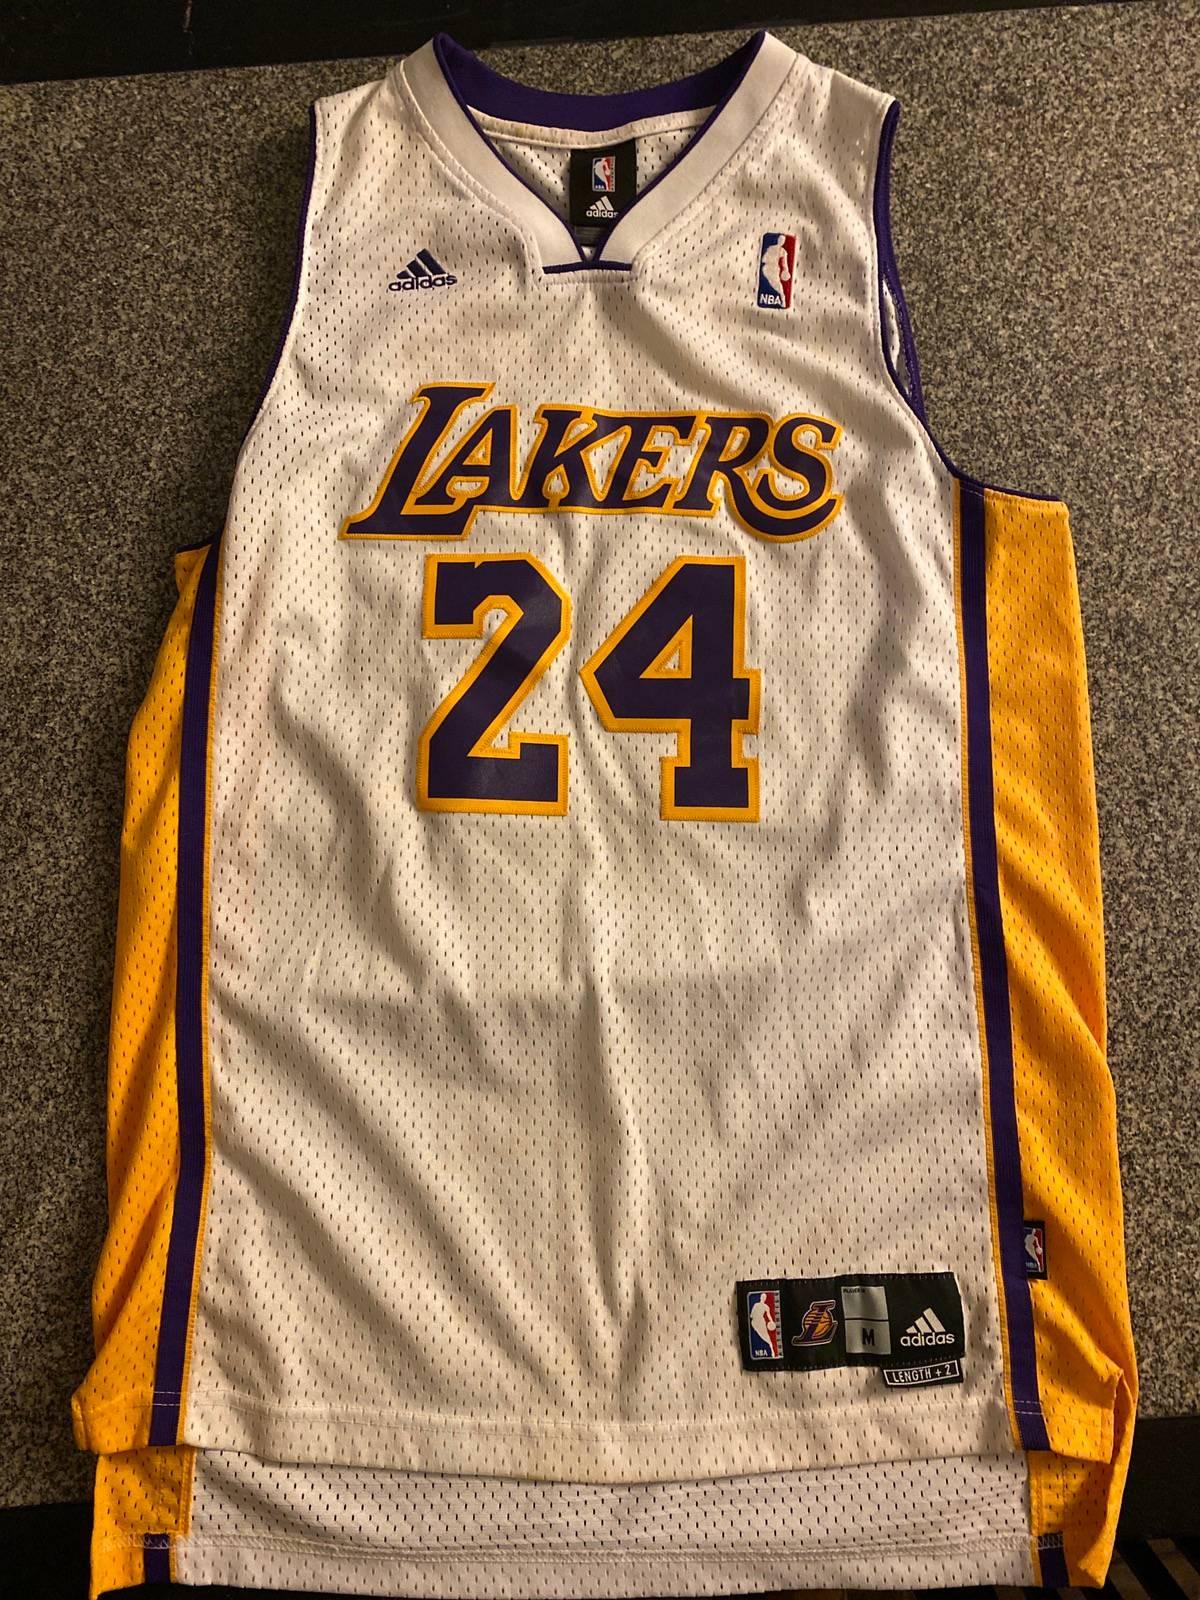 Adidas Kobe Bryant Lakers #24 White Authentic Adidas Jersey